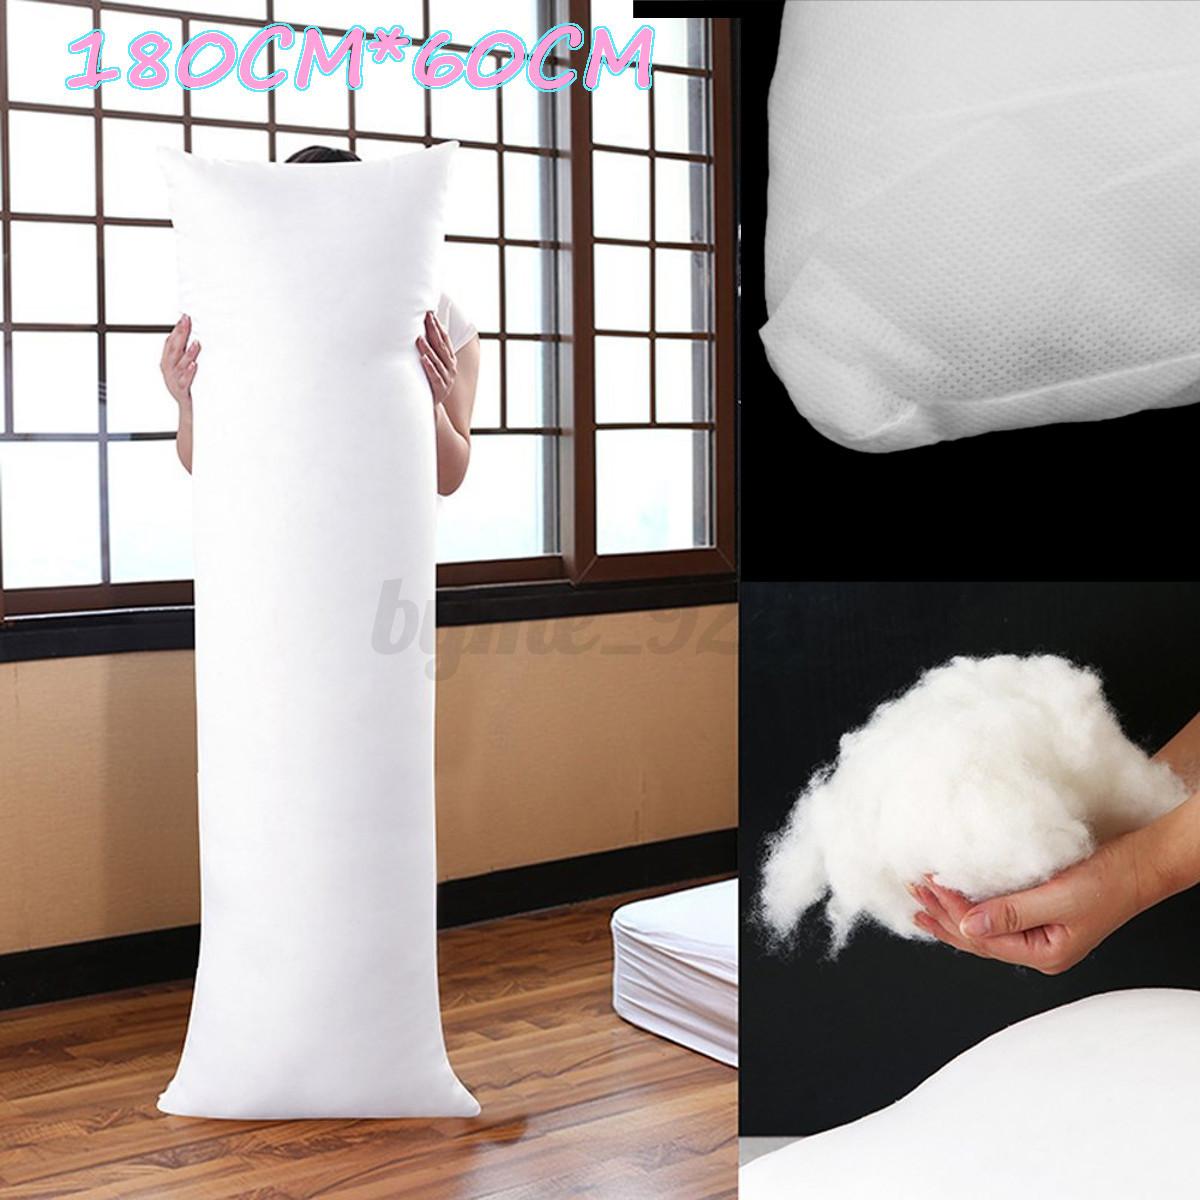 180cm x 60cm Anime Dakimakura Comfortable Hugging Pillow Inner Body Cushion